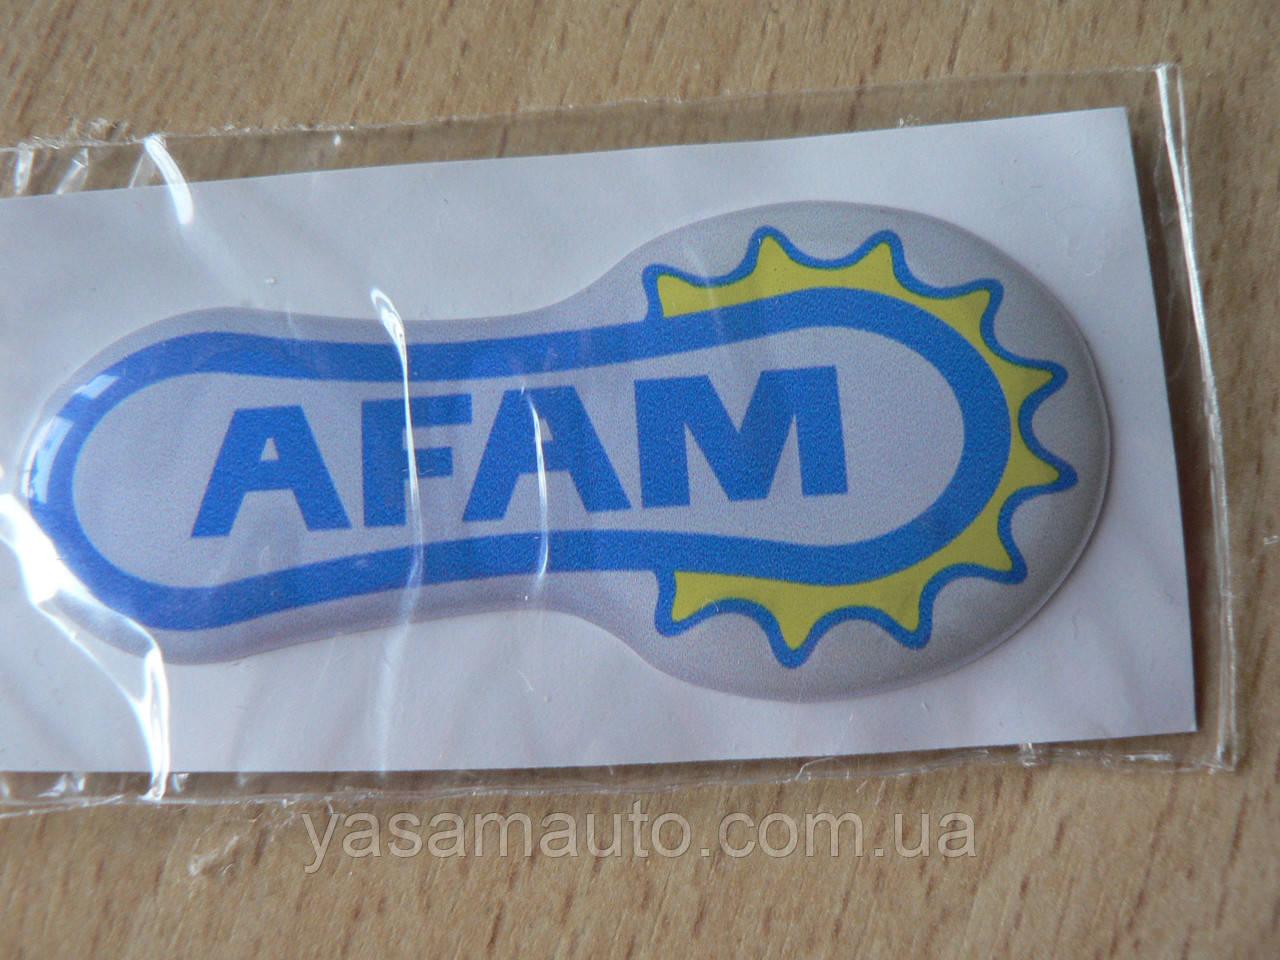 Наклейка s силиконовая мото Afam 65х30х1,7мм Афам запчасти на мотоциклы авто